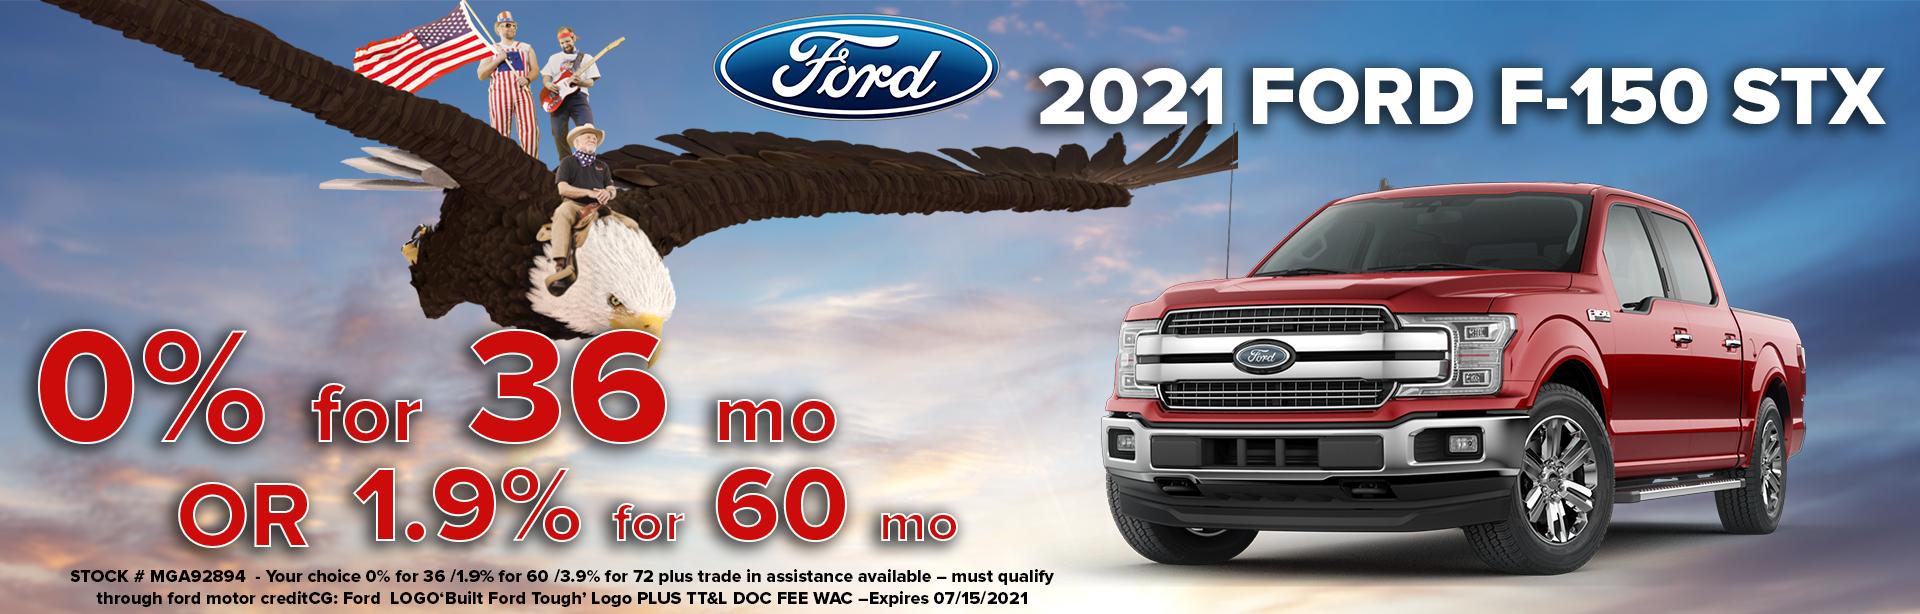 get a 2021 ford f150 stx